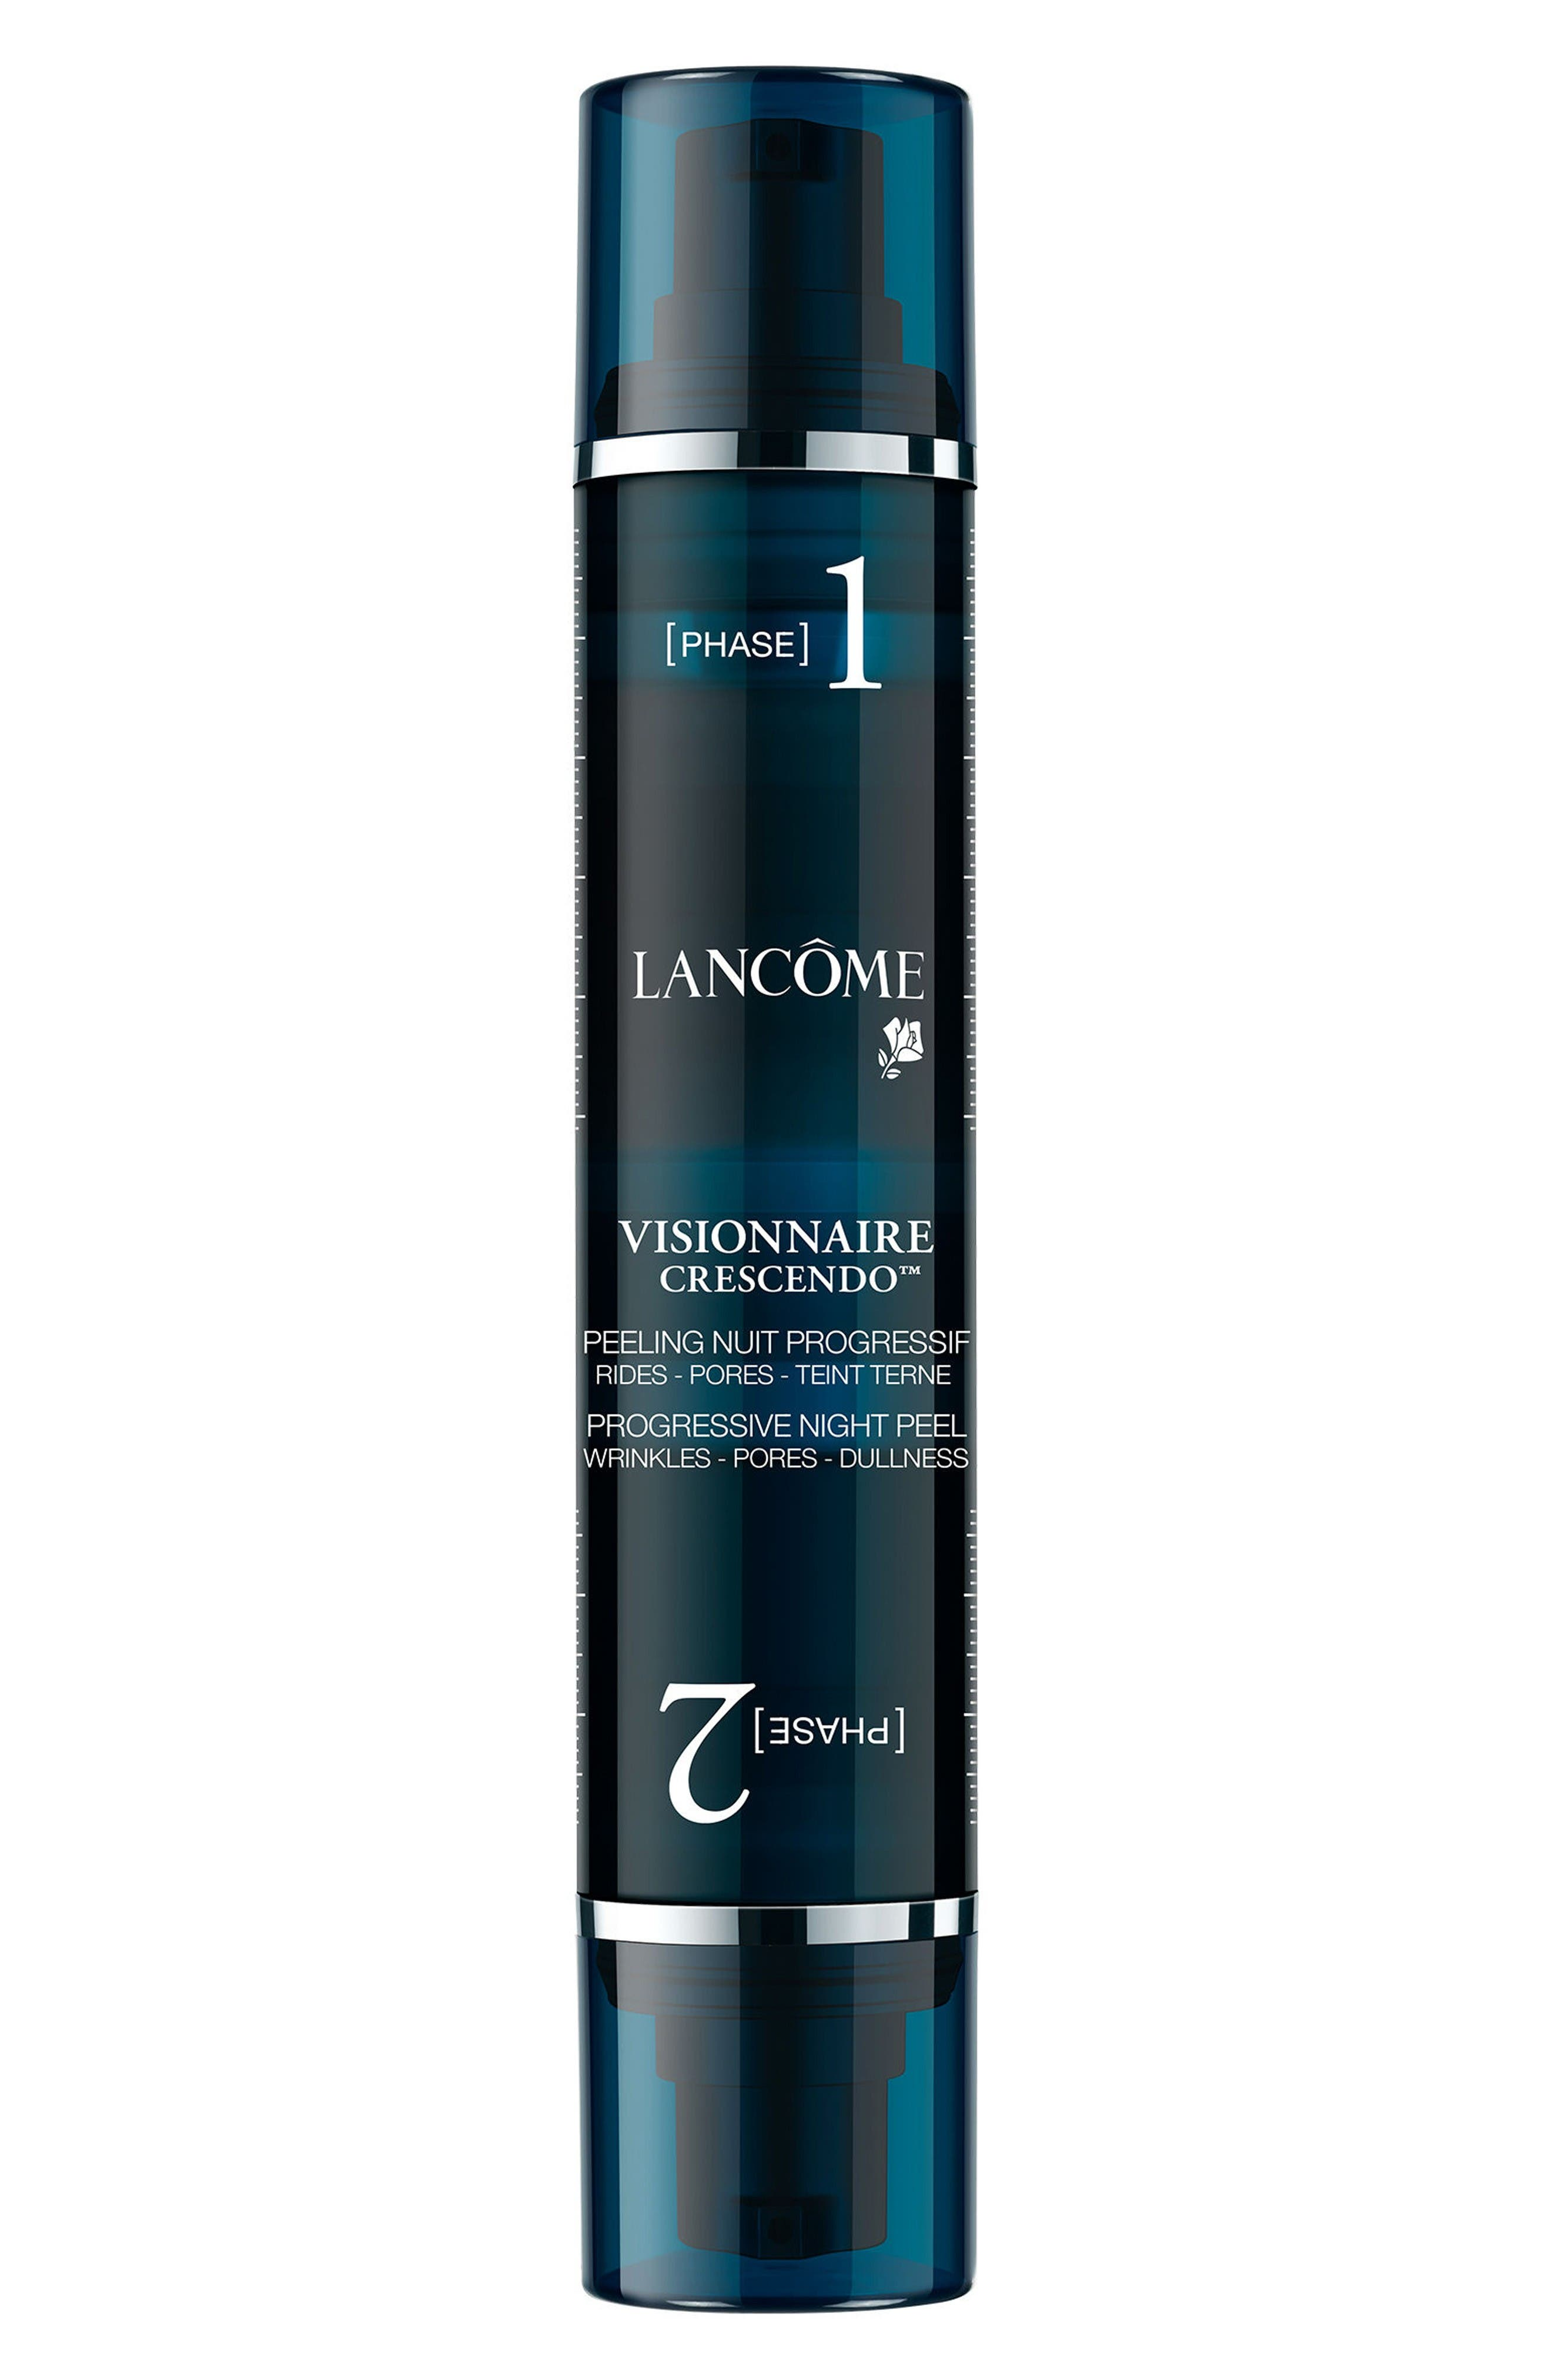 Main Image - Lancôme Visionnaire Crescendo™ Progressive Night Peel